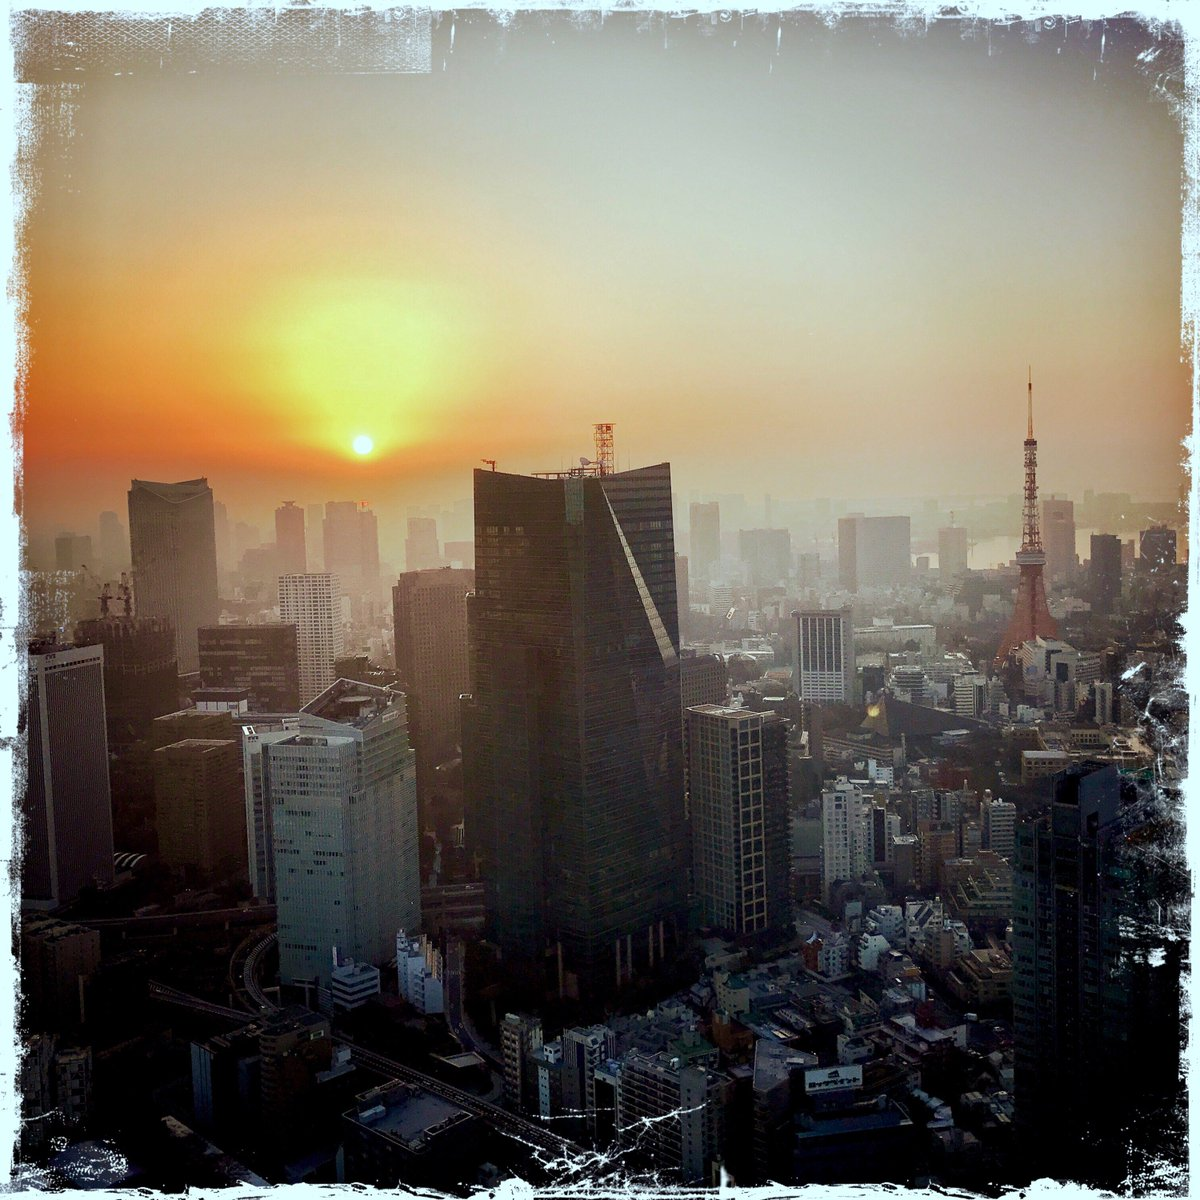 Tokyo Last premiere for Valerian